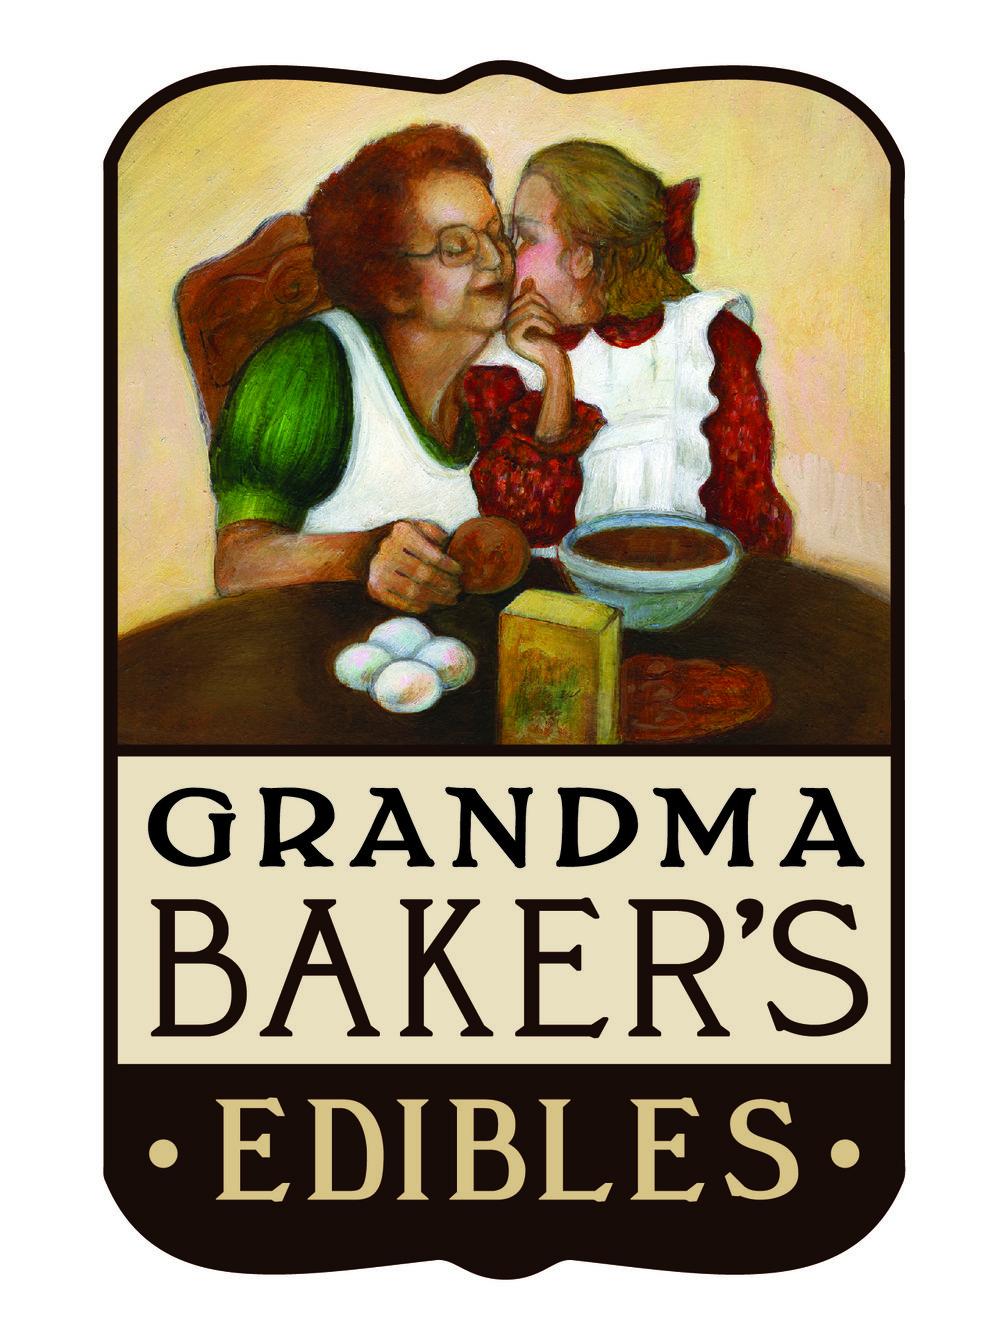 GrandmaBakers Logo_BoxColorEDIBLES.jpg